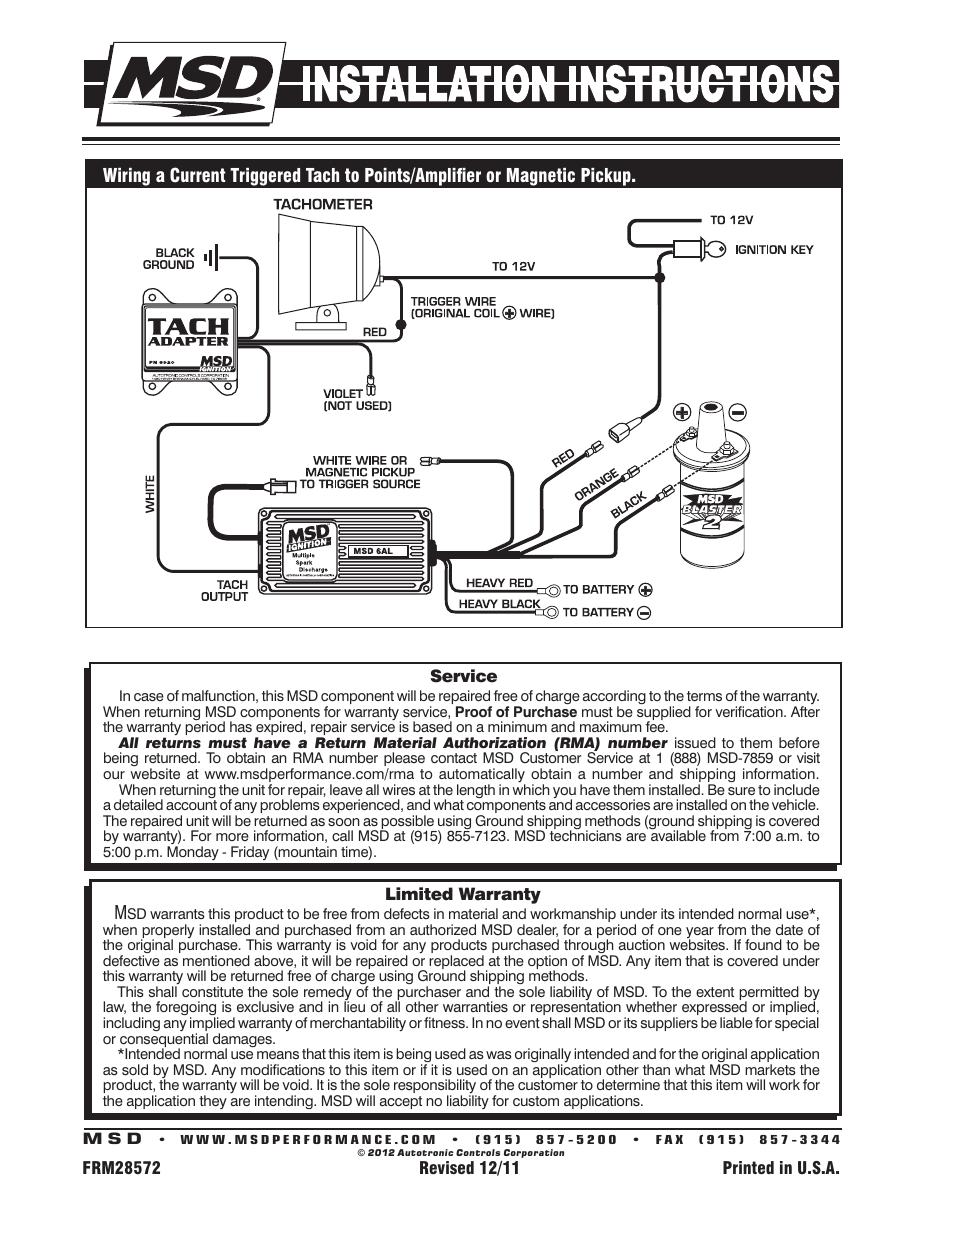 Msd 8920 Tach Adapter  Magnetic Trigger Installation User